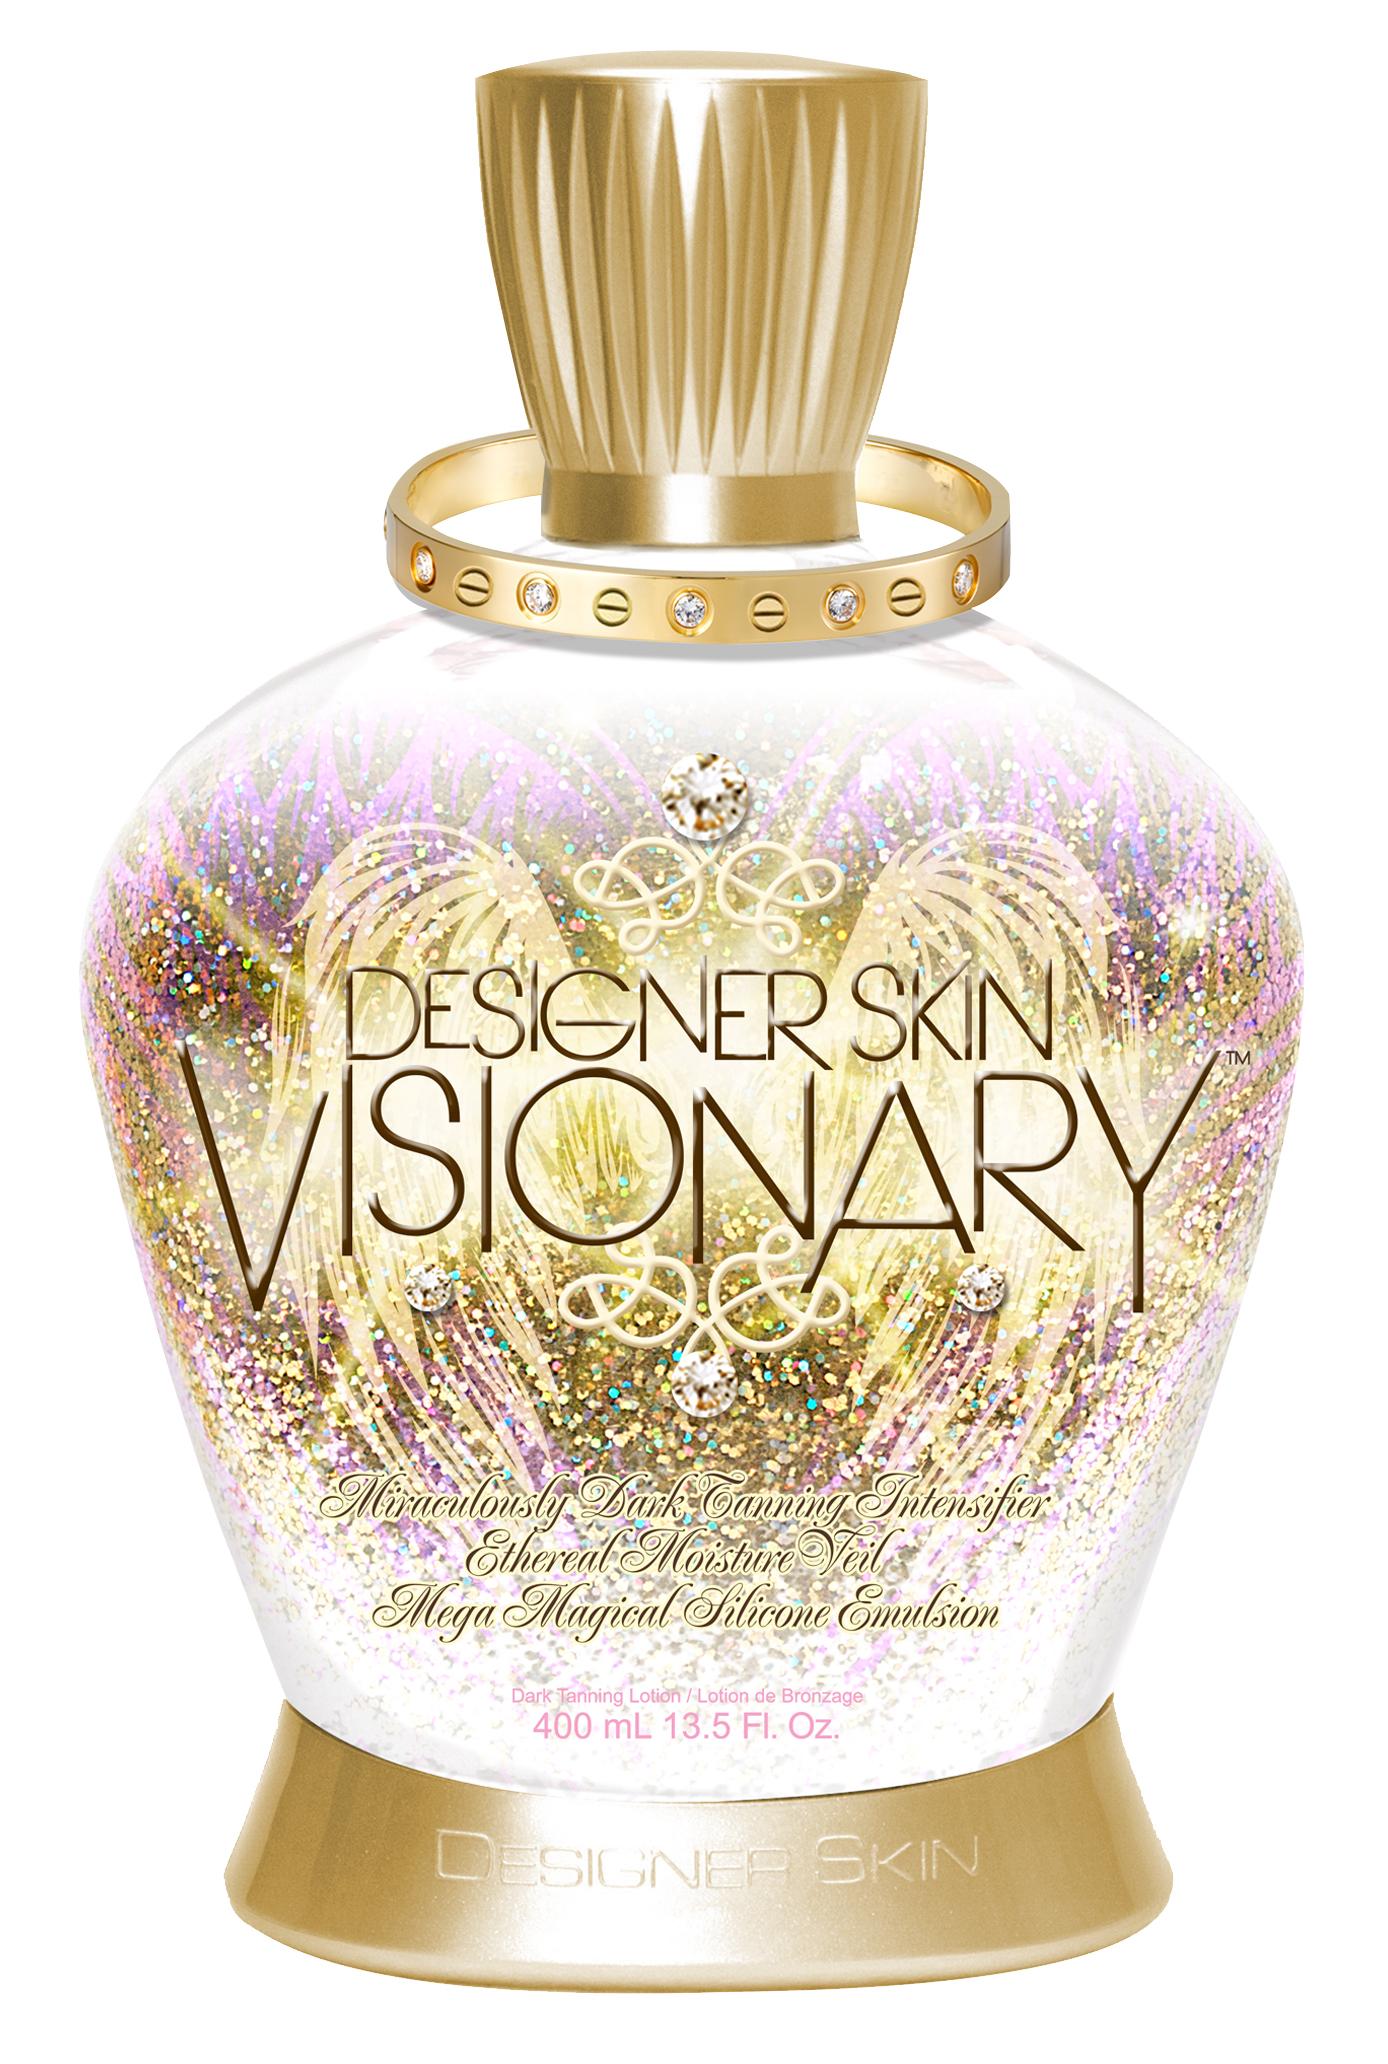 Designer Skin Visionary™ Intensifier